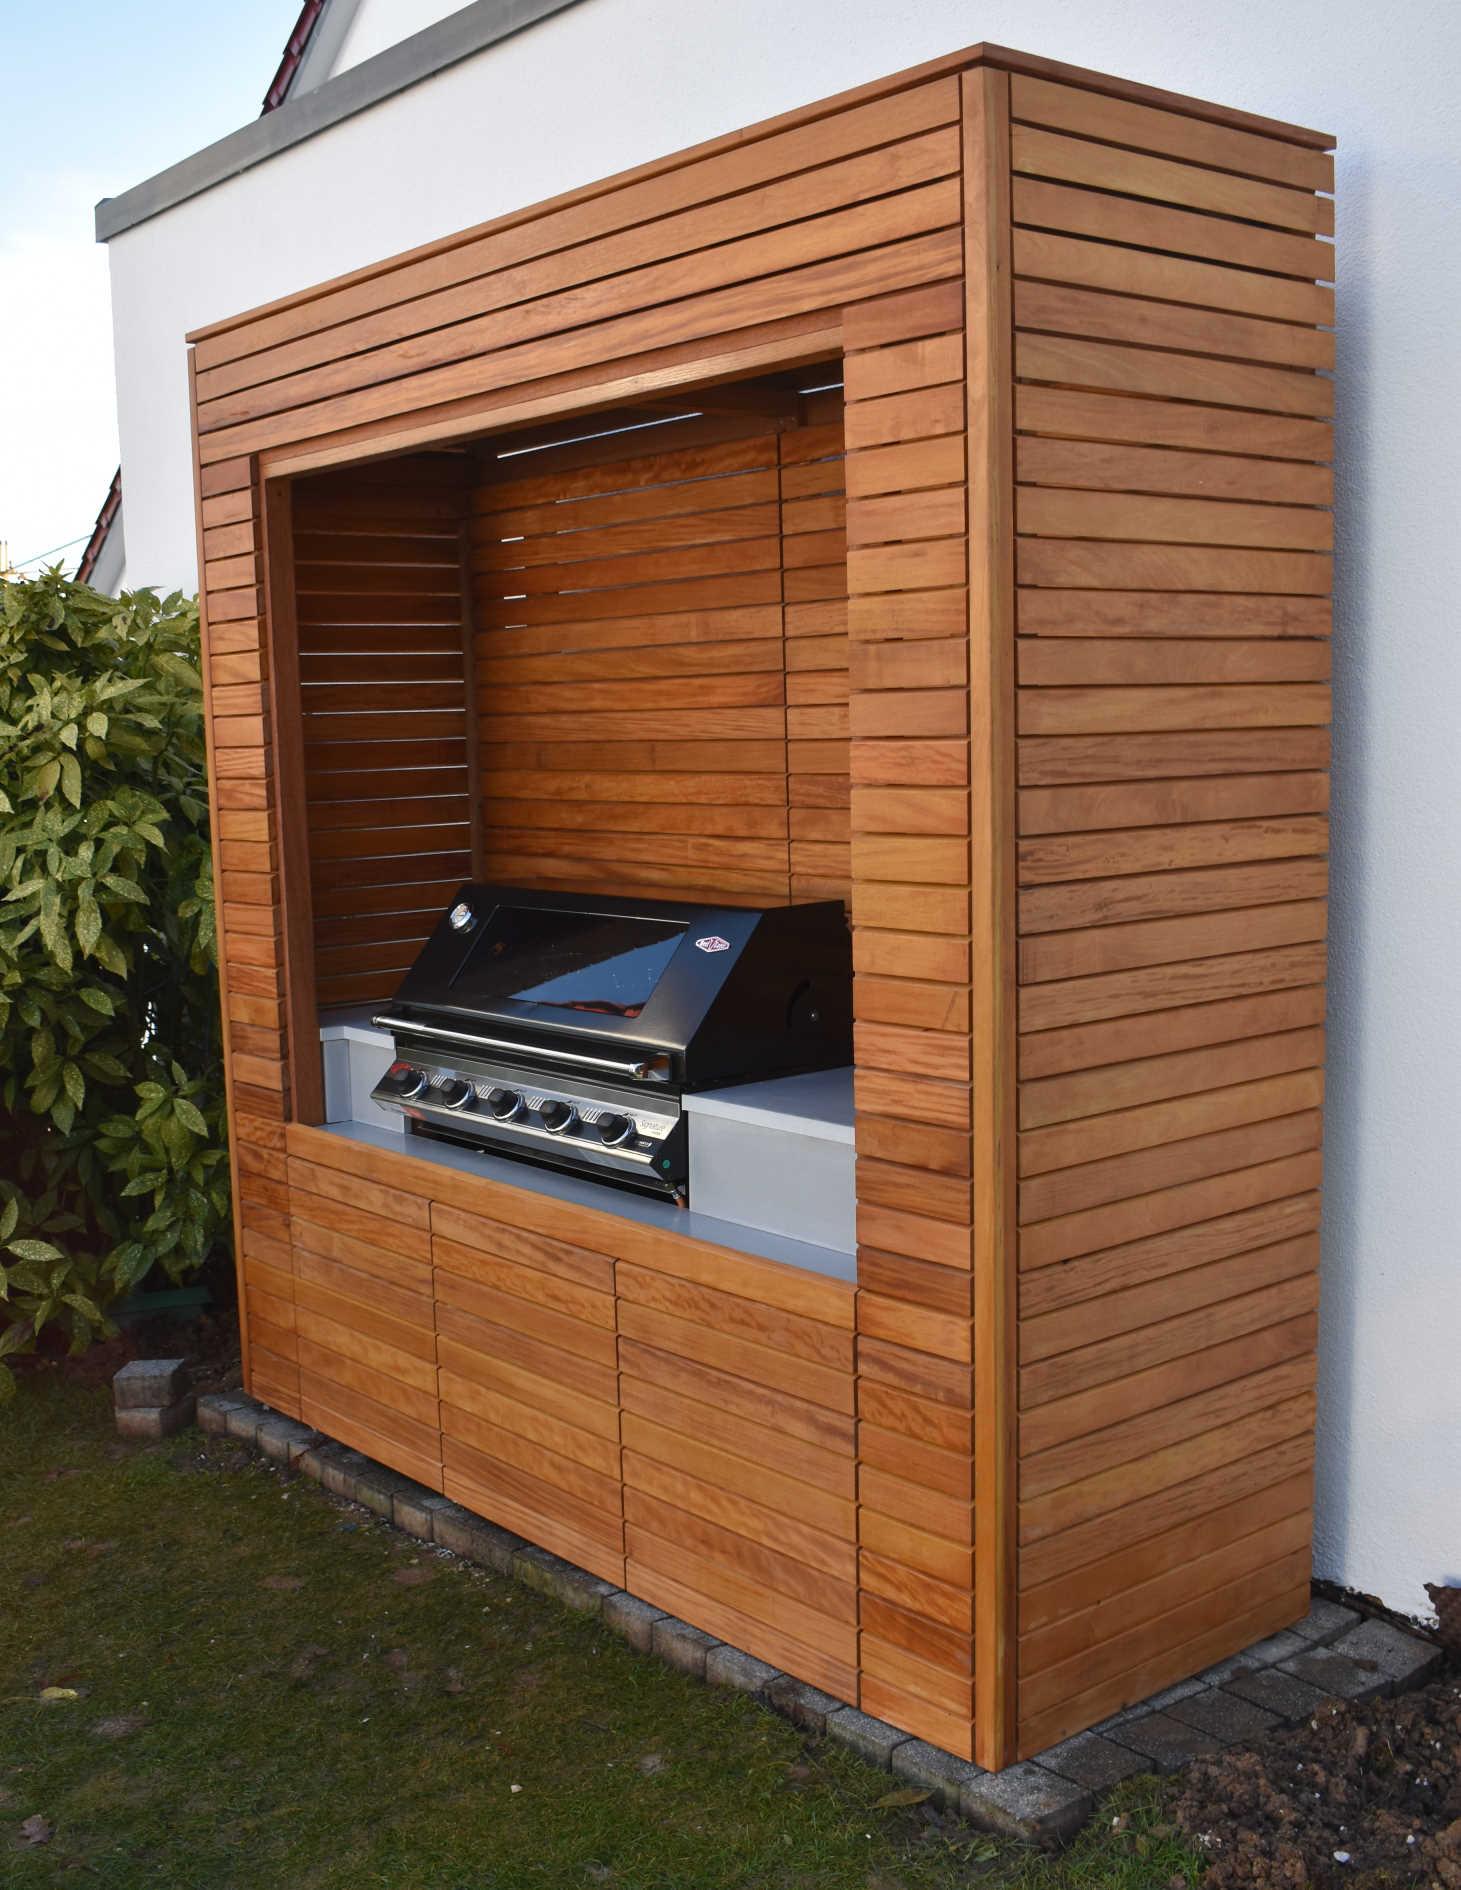 mainTisch Aussenküche Grill Feuerplatte mainGrill Beton Garten Sanne living (2)